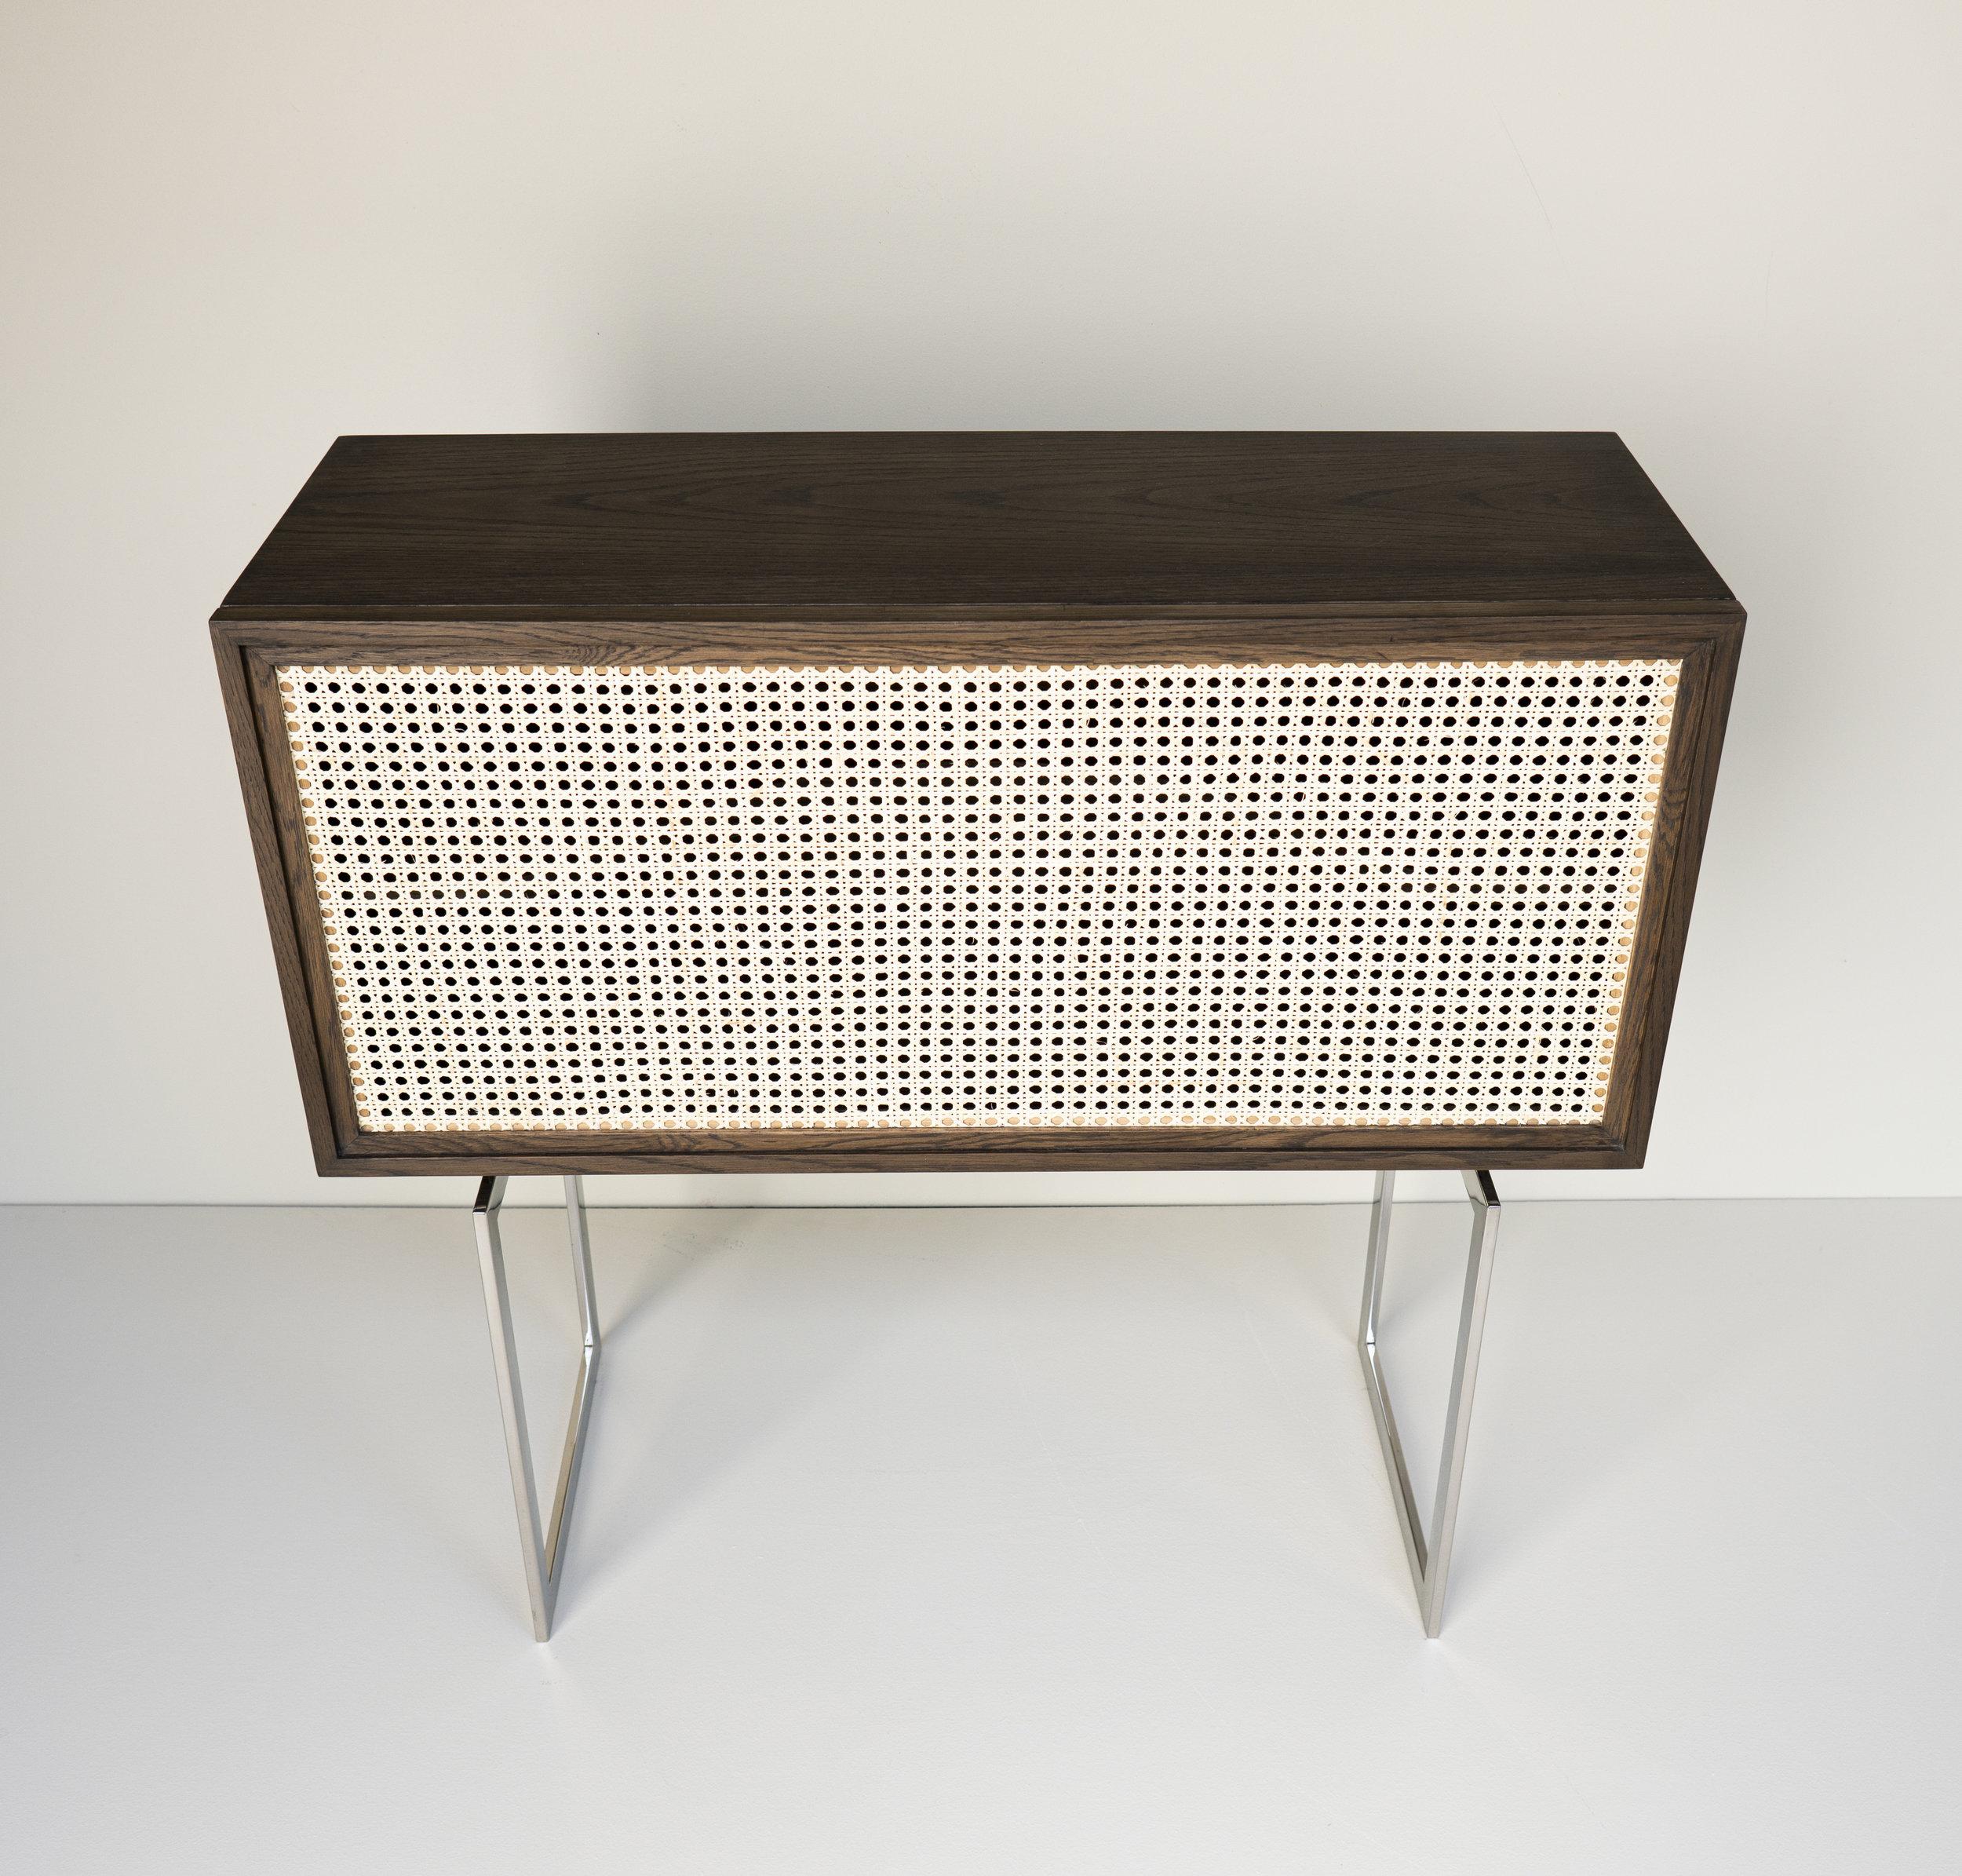 Hein Studio - 9029 Cabinet Black                        .jpg